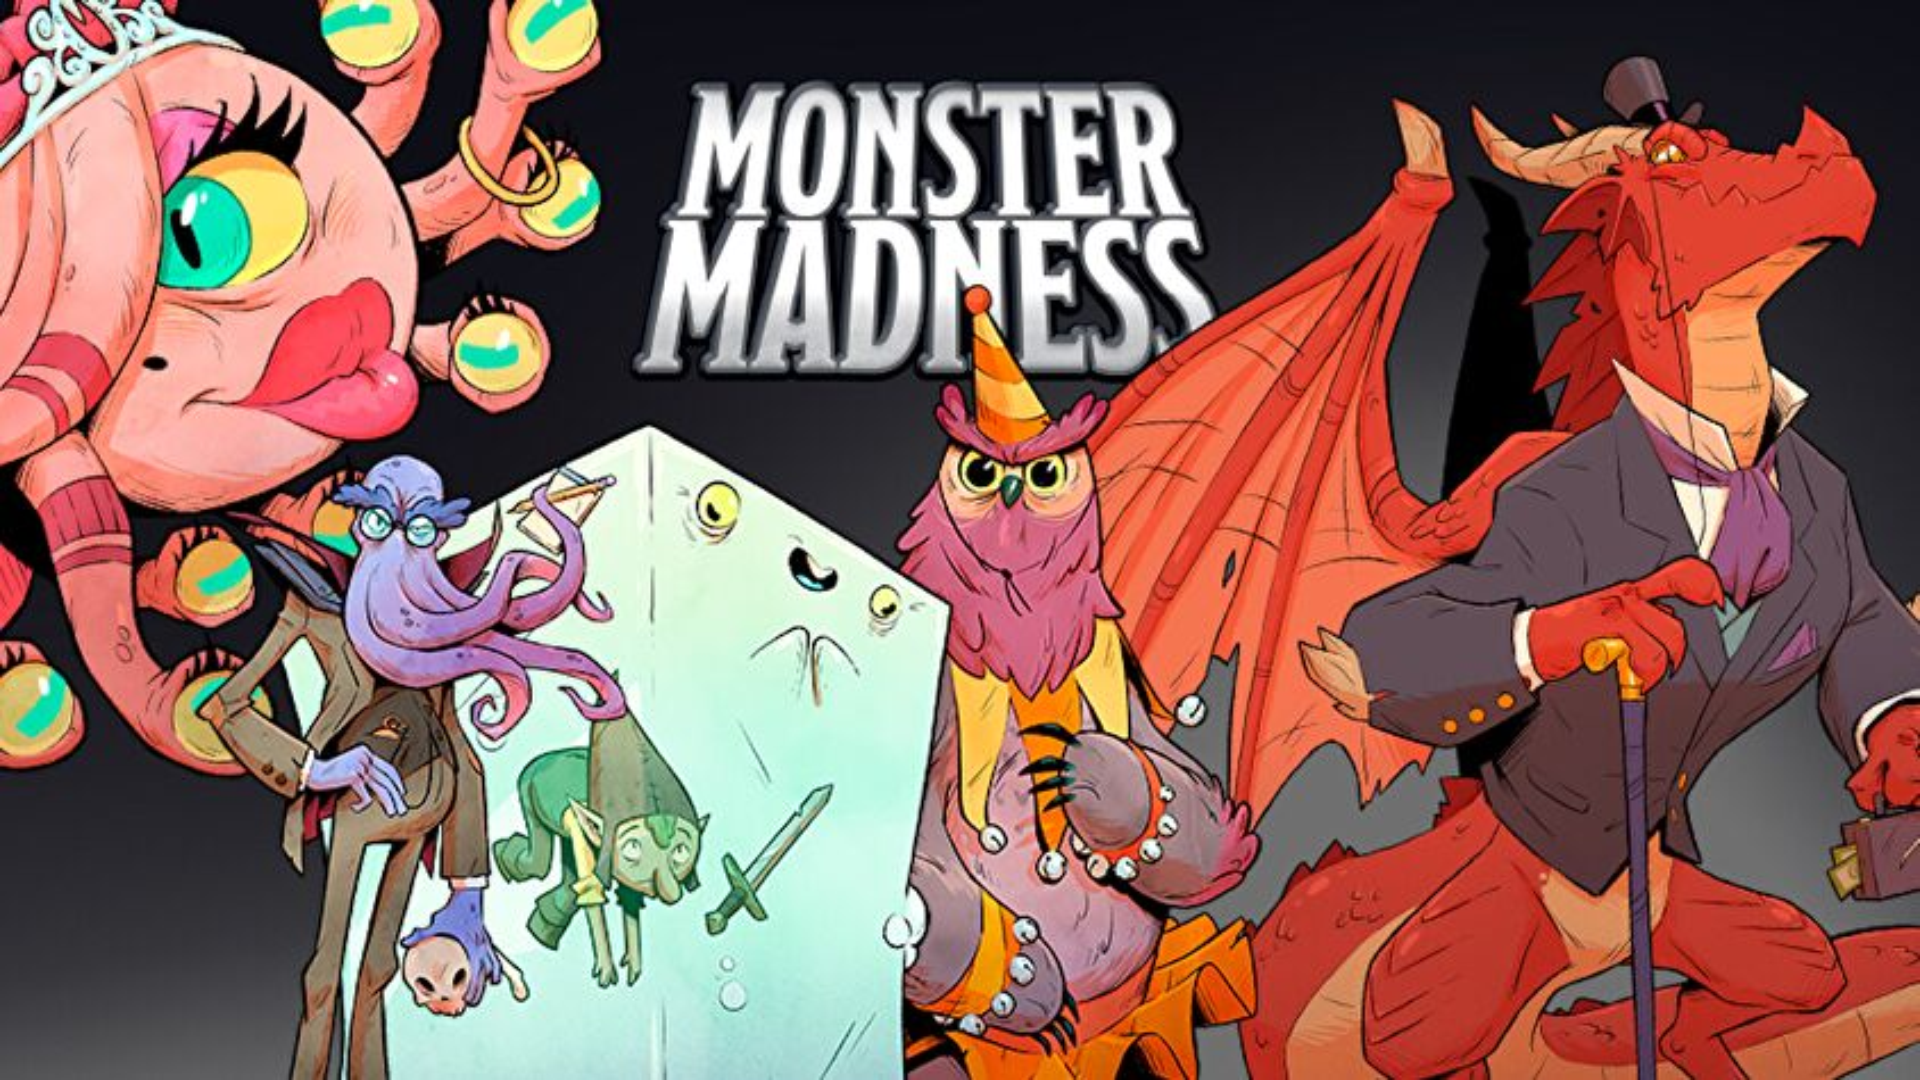 Dungeons & Dragons Dungeon Mayhem: Monster Madness artwork.